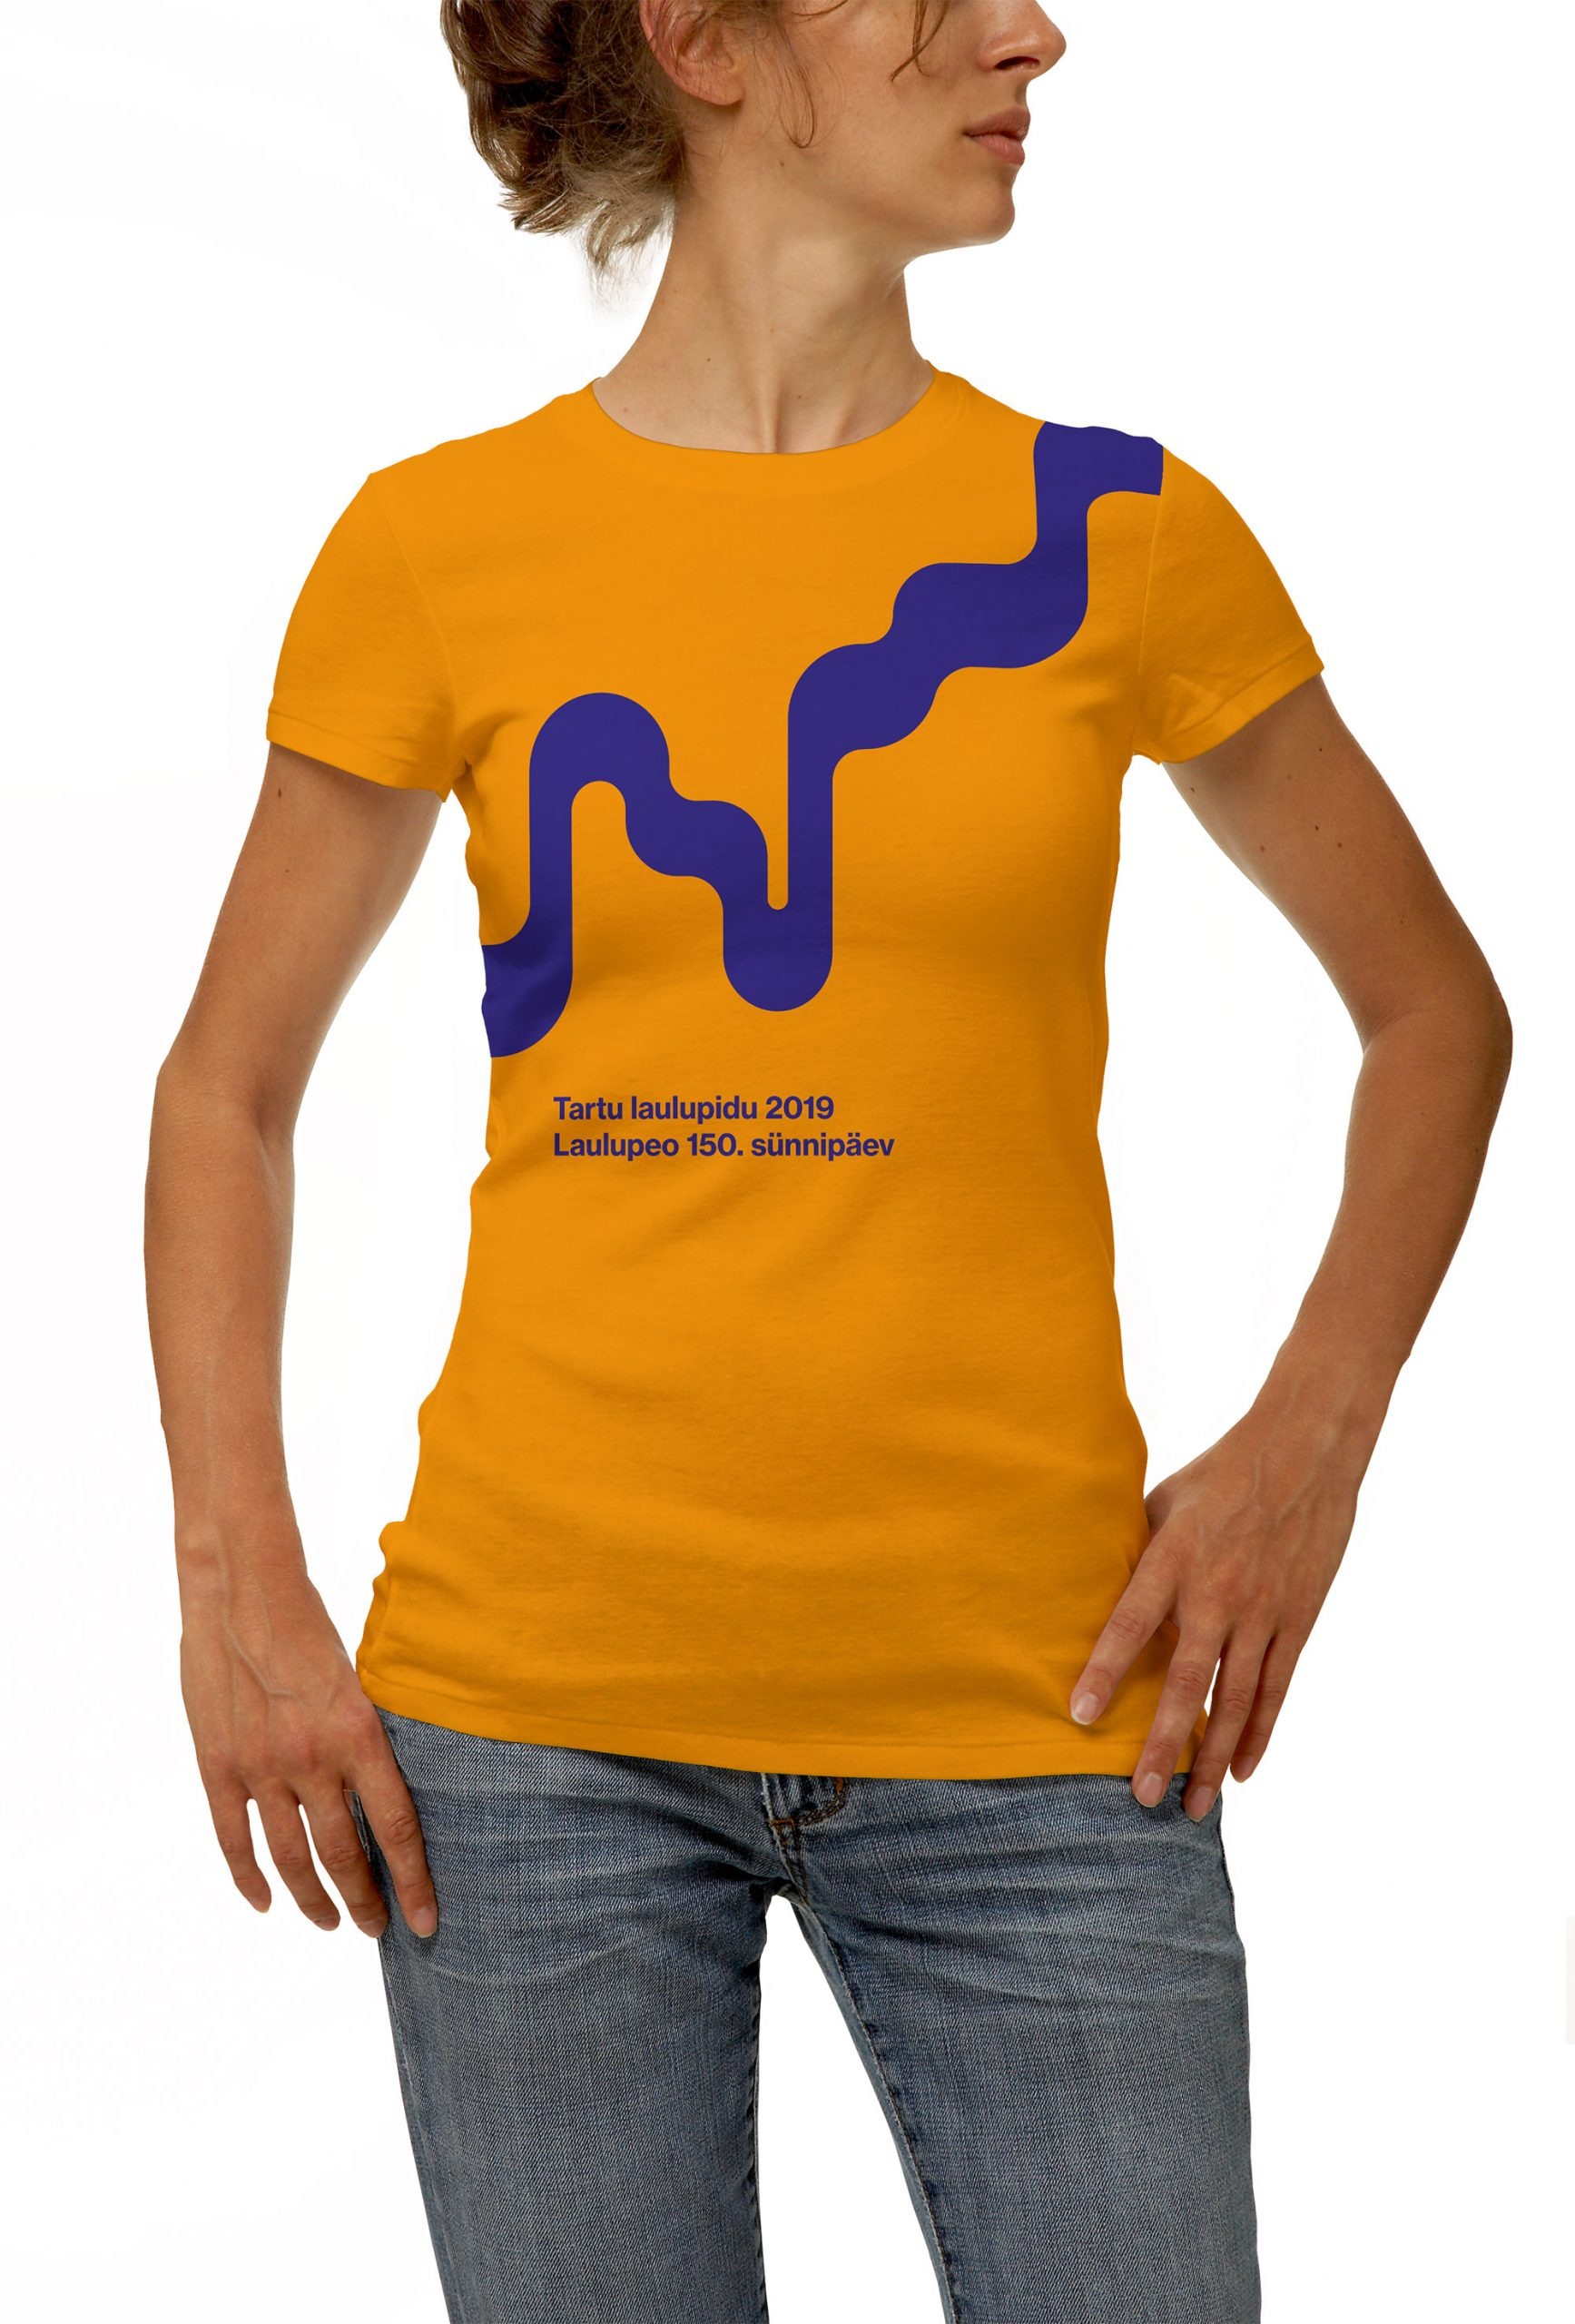 Shirt 0246 2019-09-05